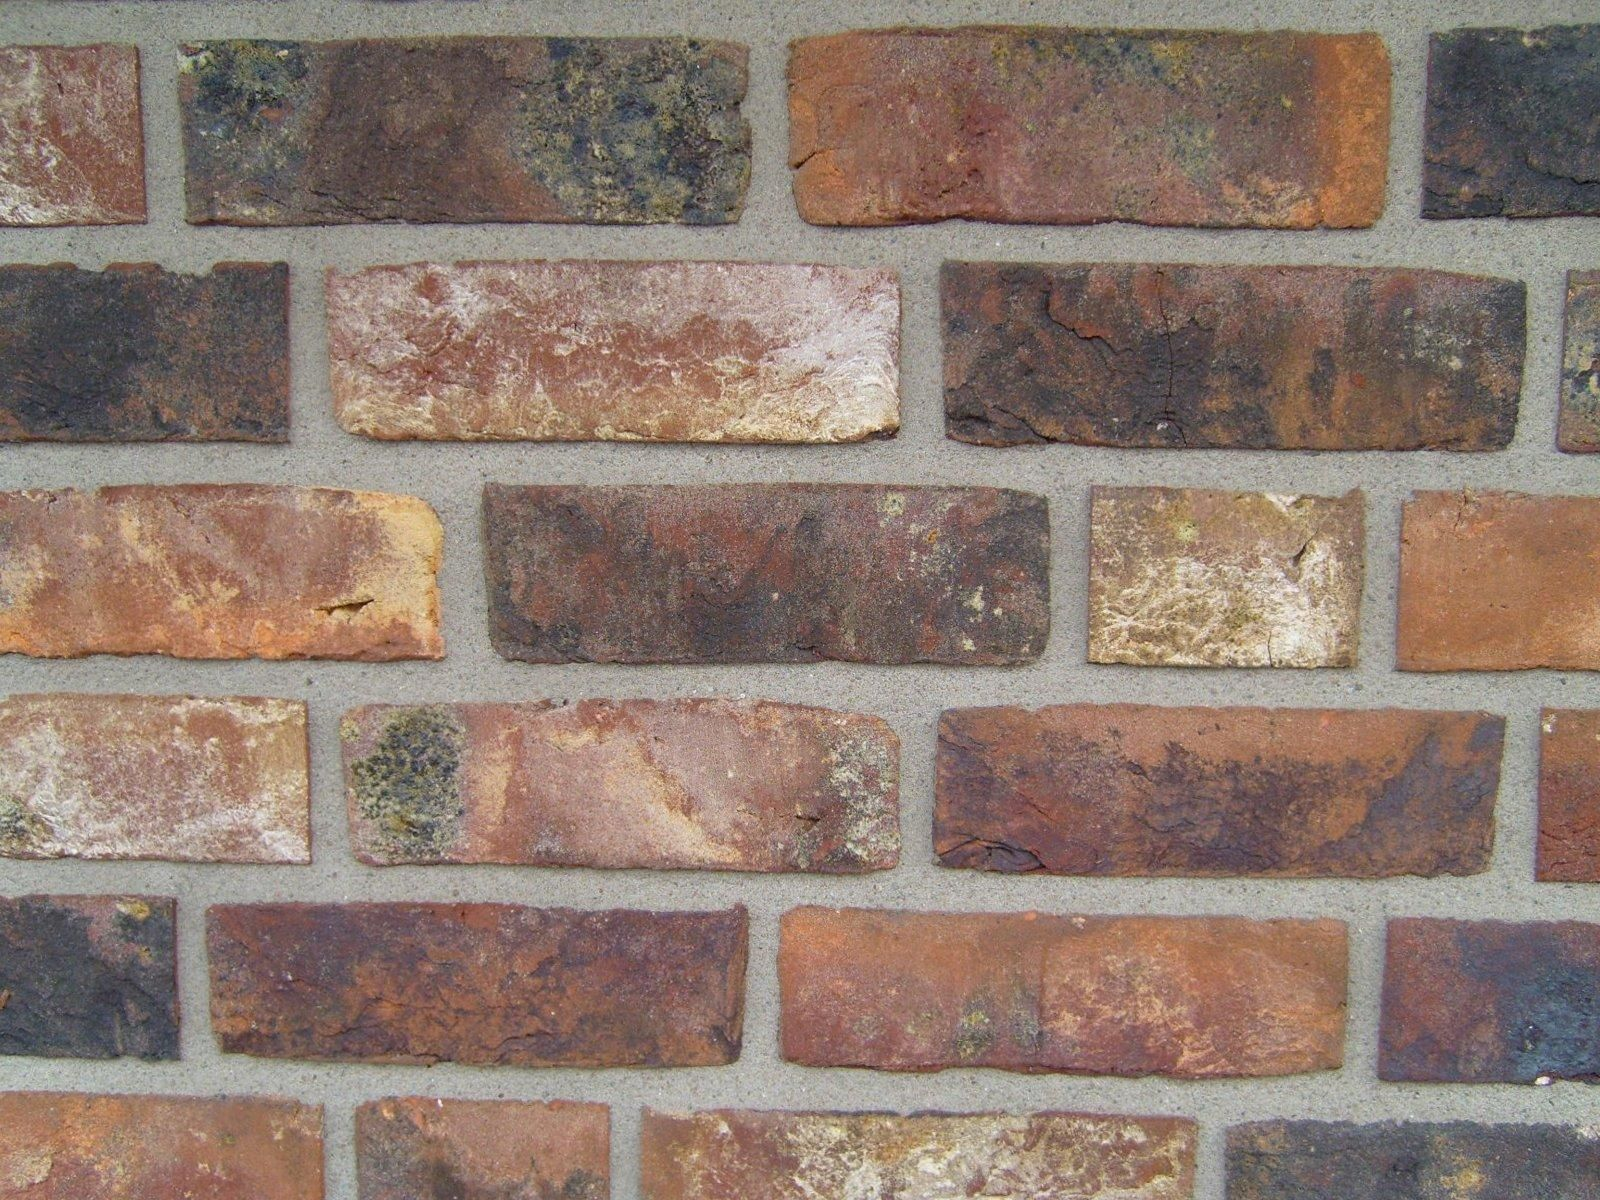 Decorative Brick Walls : File decorative brick wall g wikimedia commons